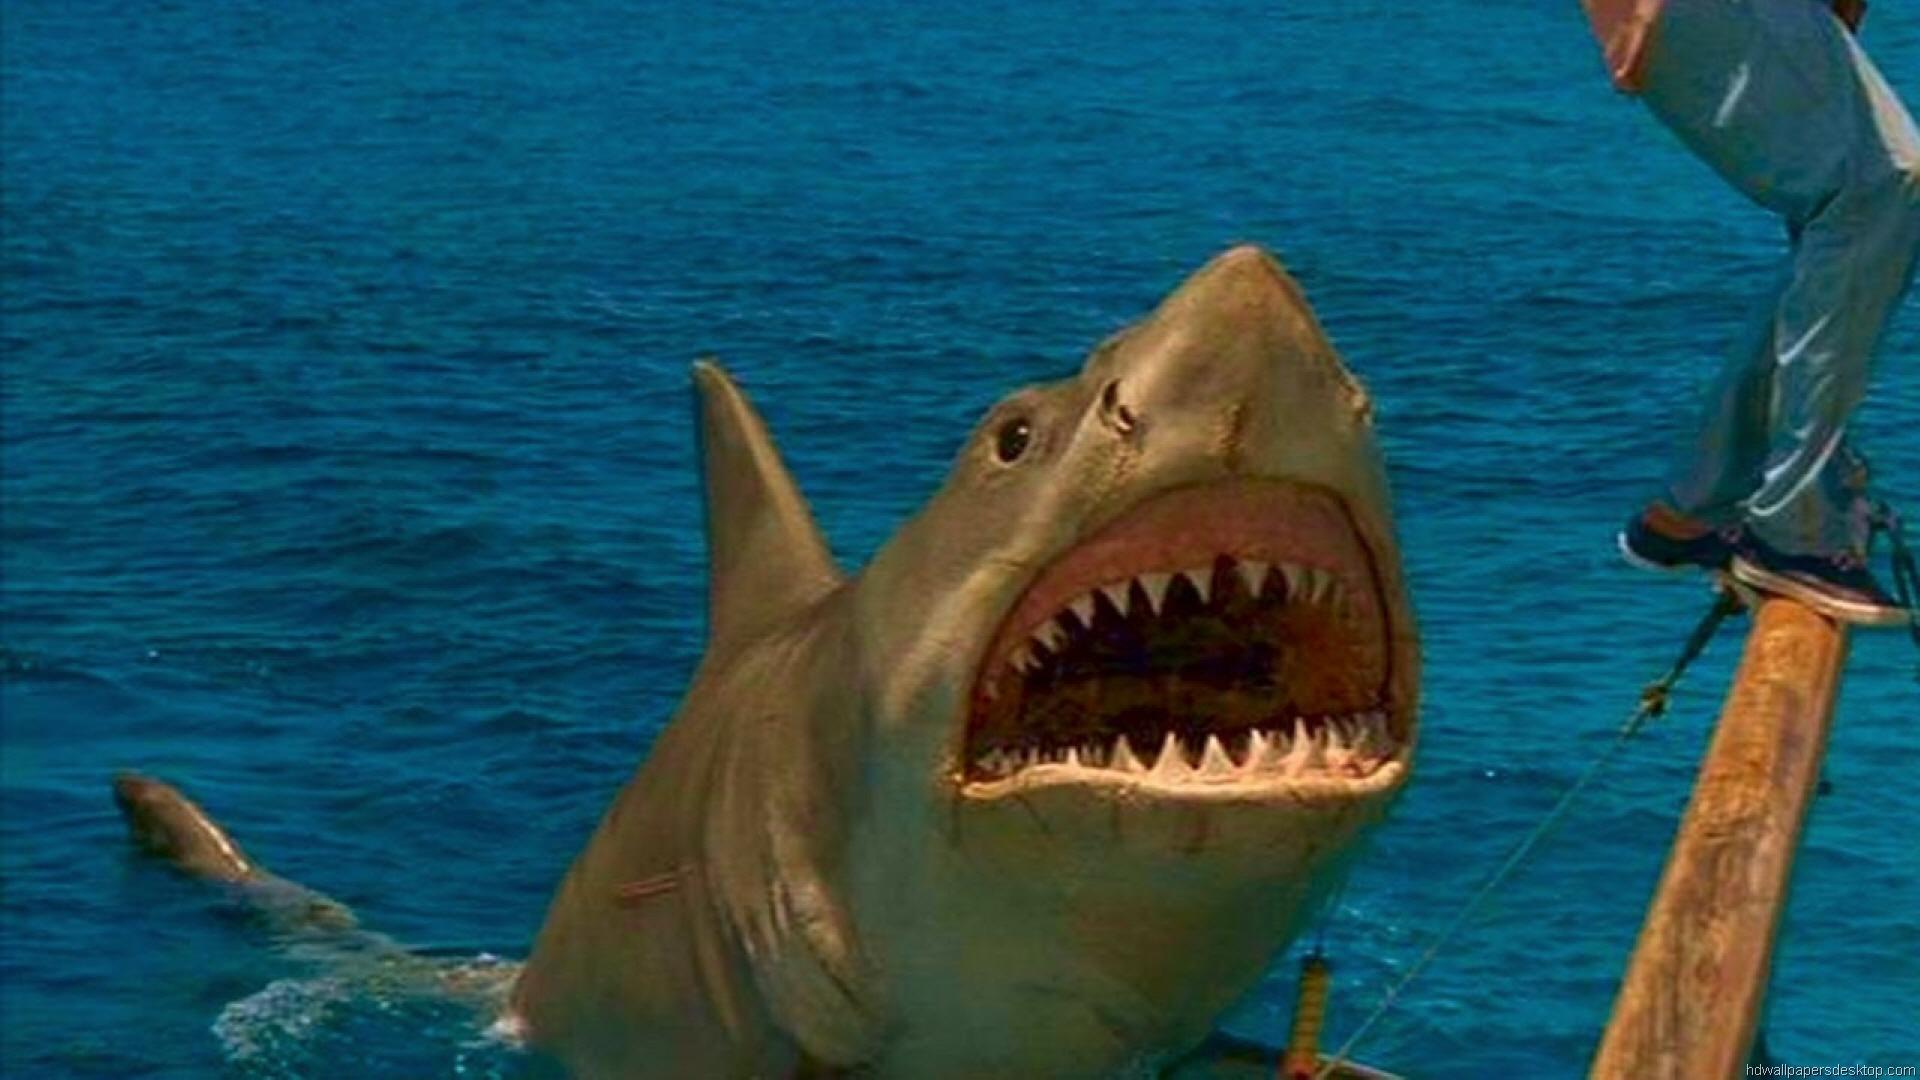 Jaws (Series) Deaths